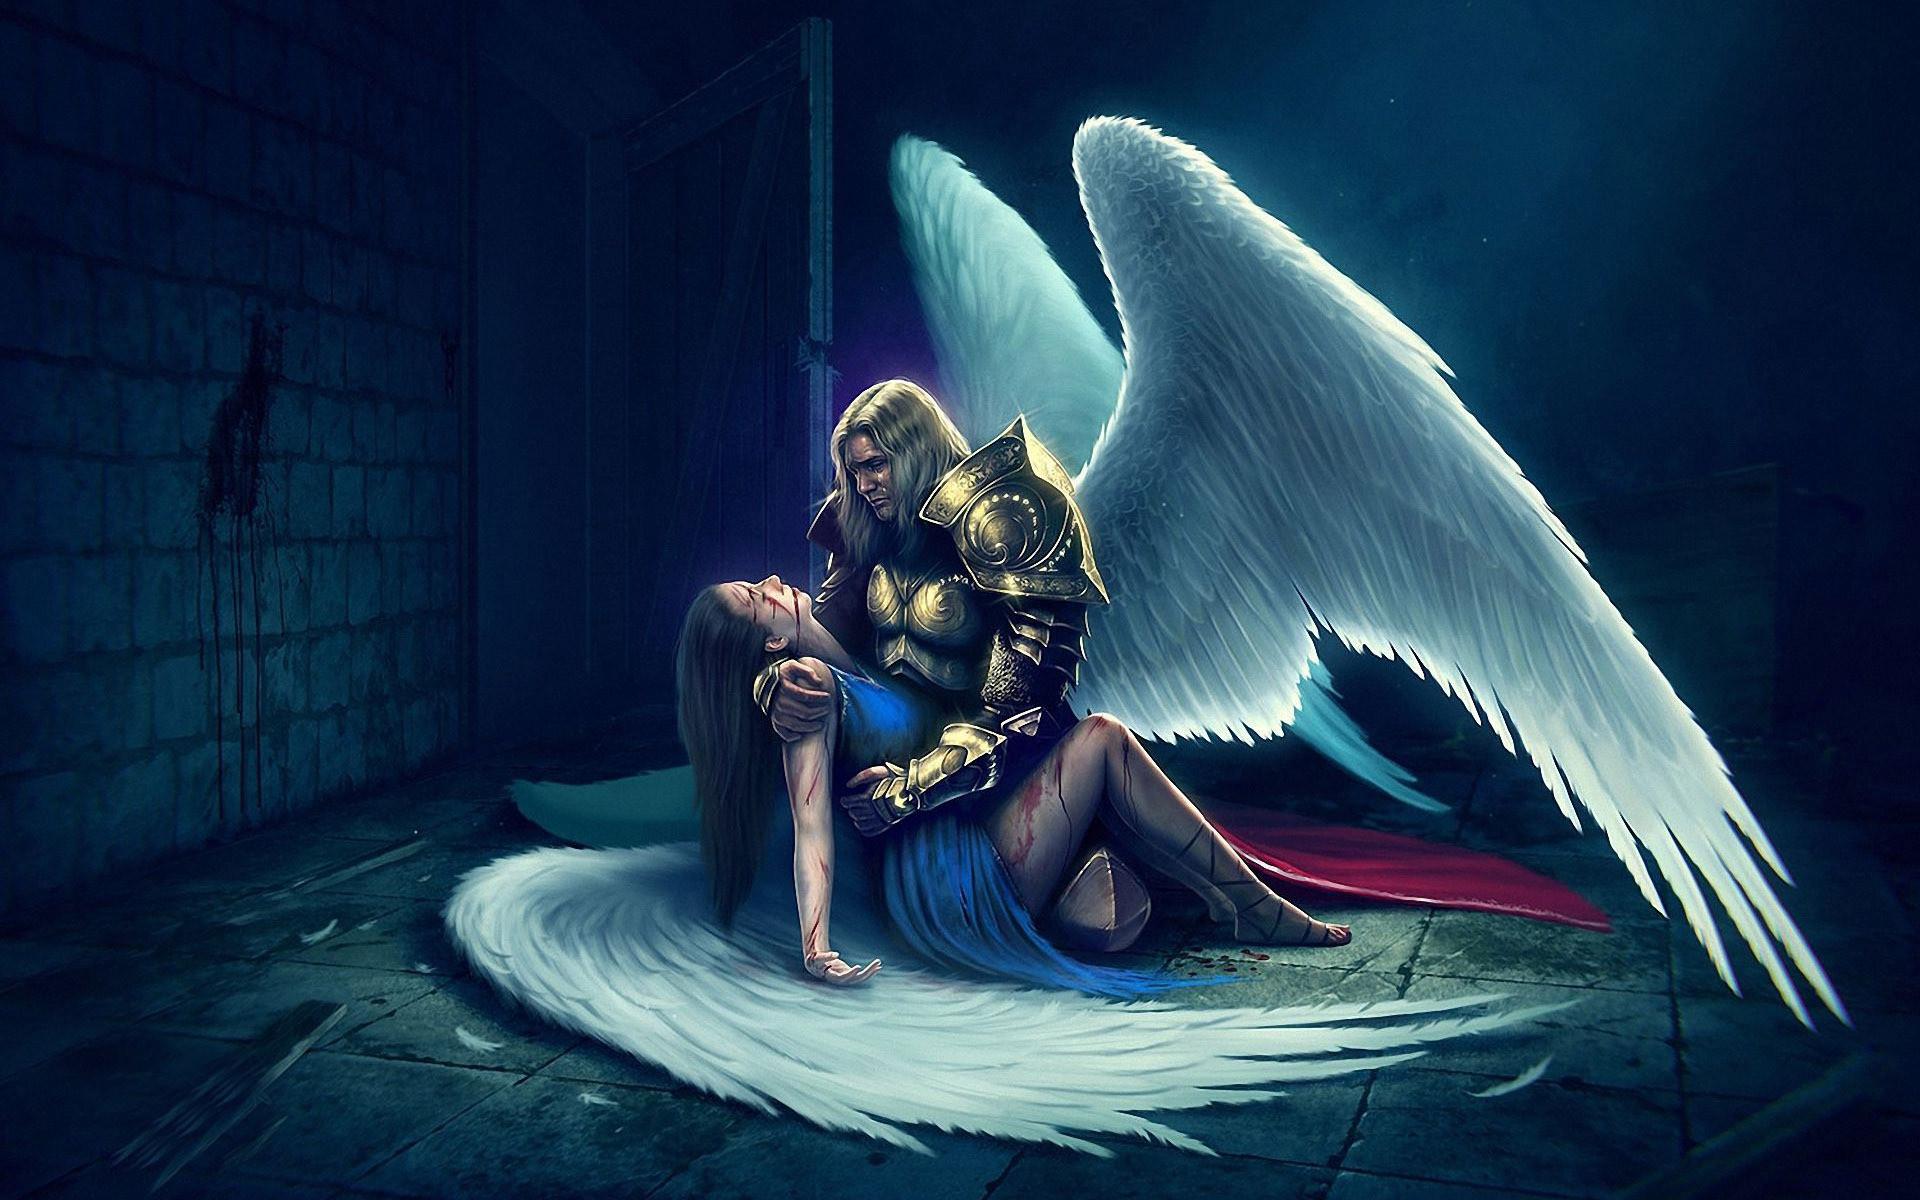 Dying angel wallpaper #18413